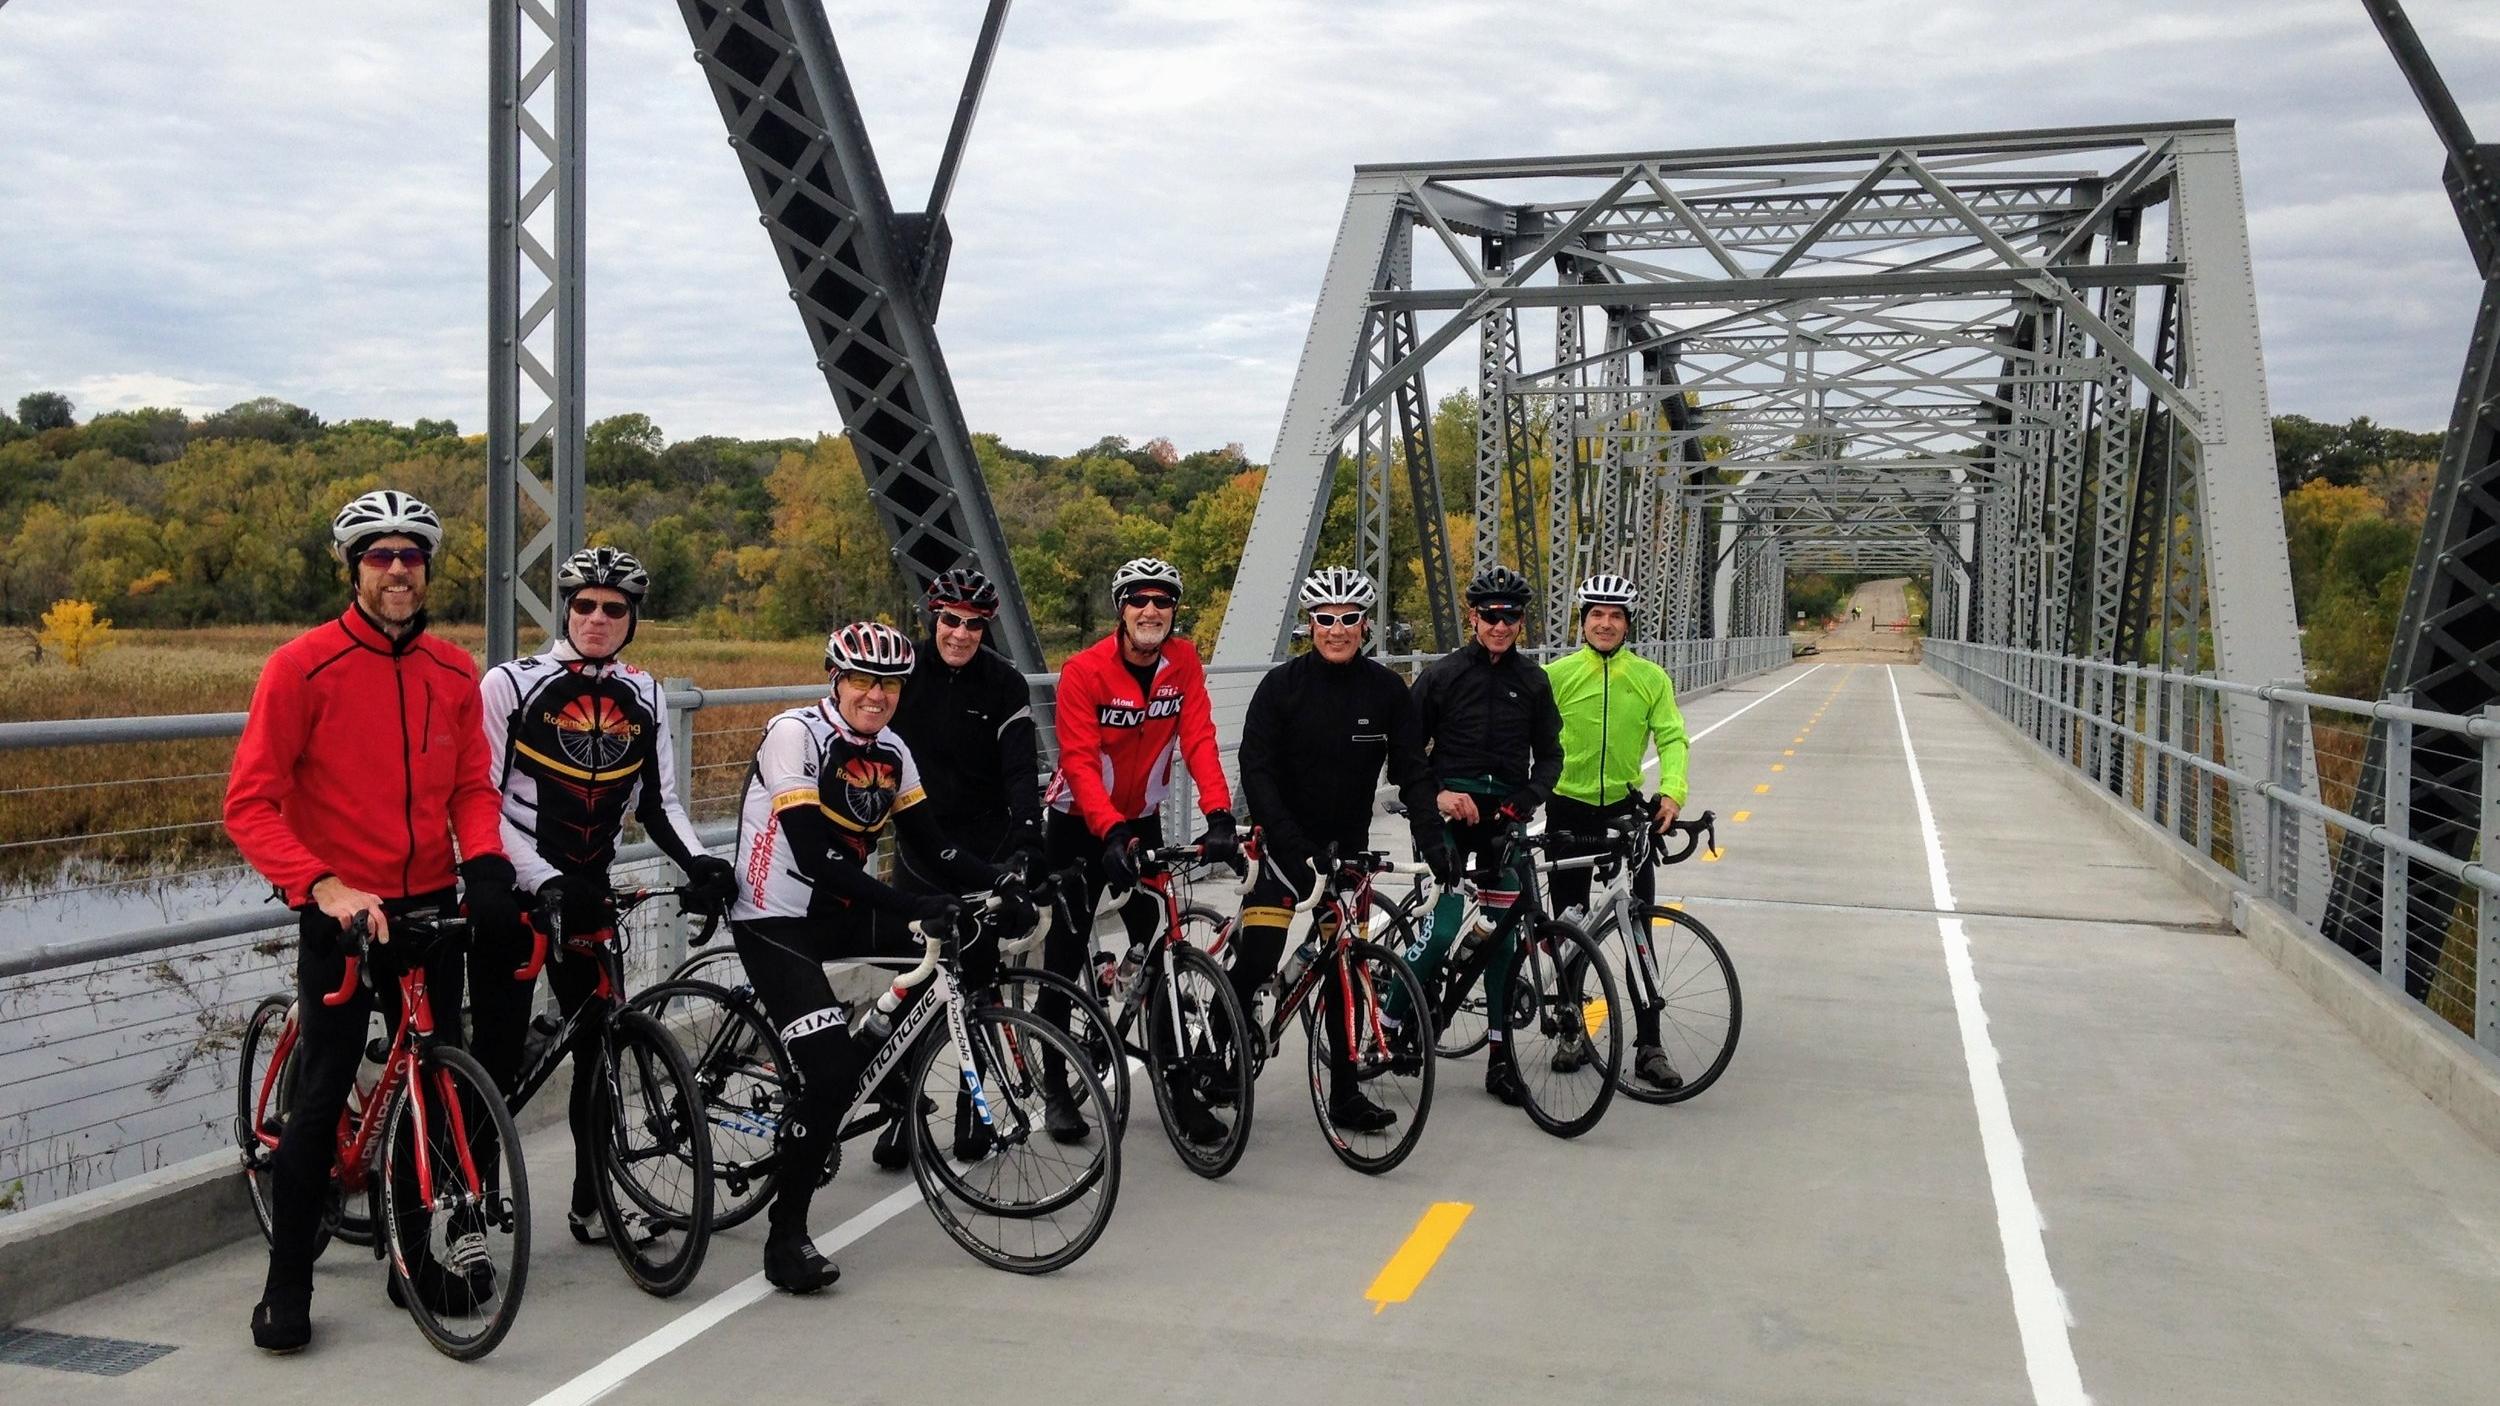 2016 - Old Cedar Avenue Bridge, Bloomington MN; 2016-10-08